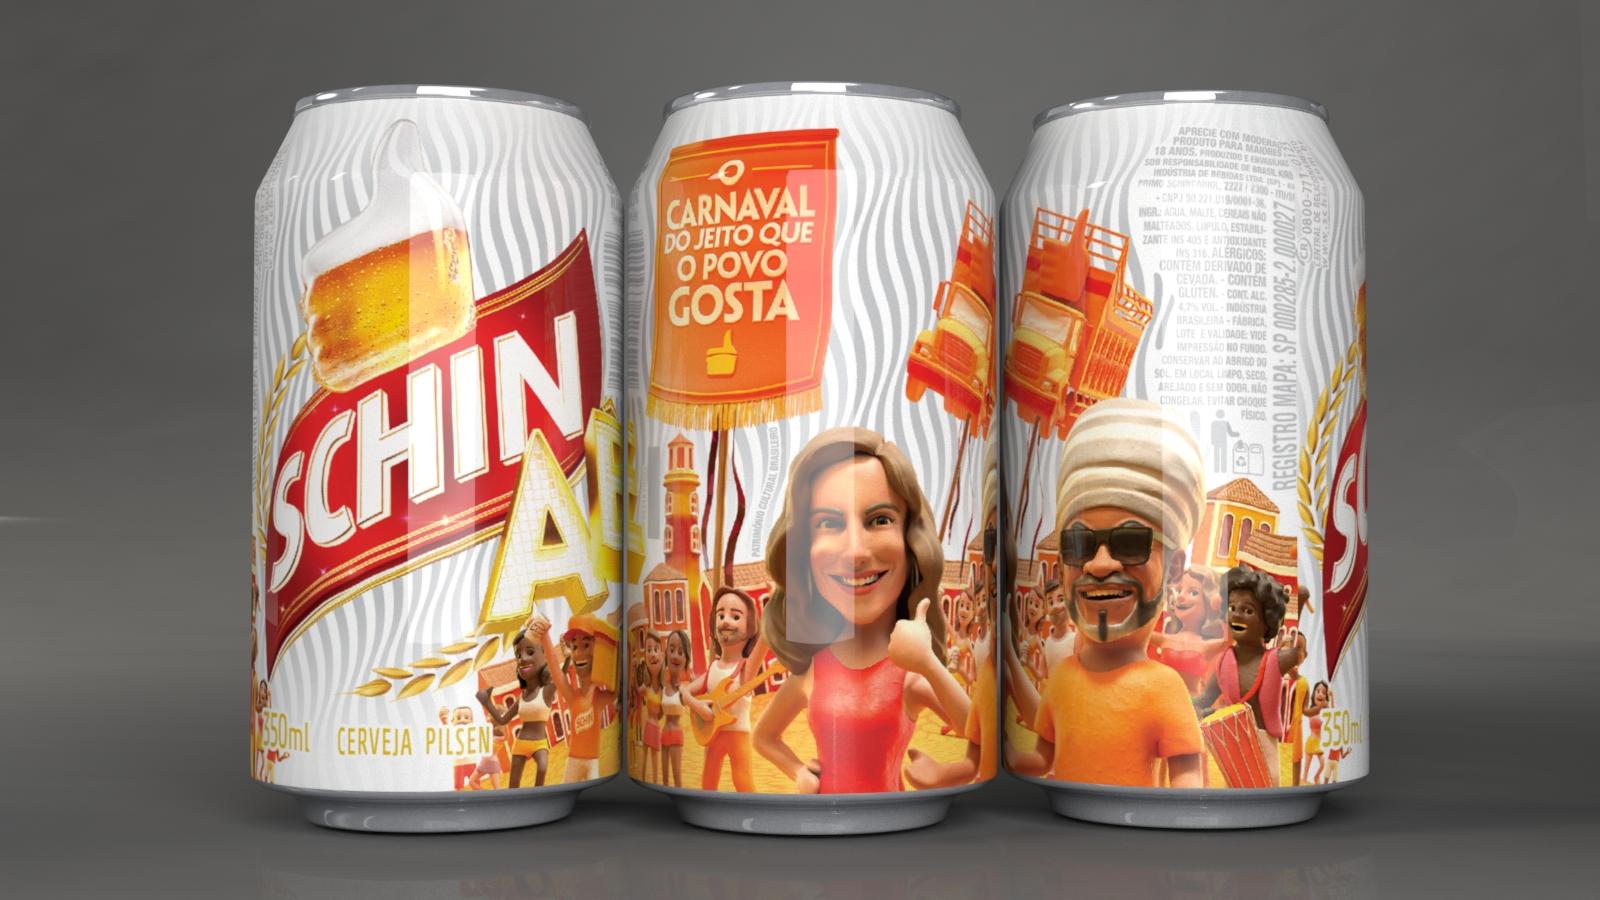 Carnaval Schin Aê 2017 Embalagem